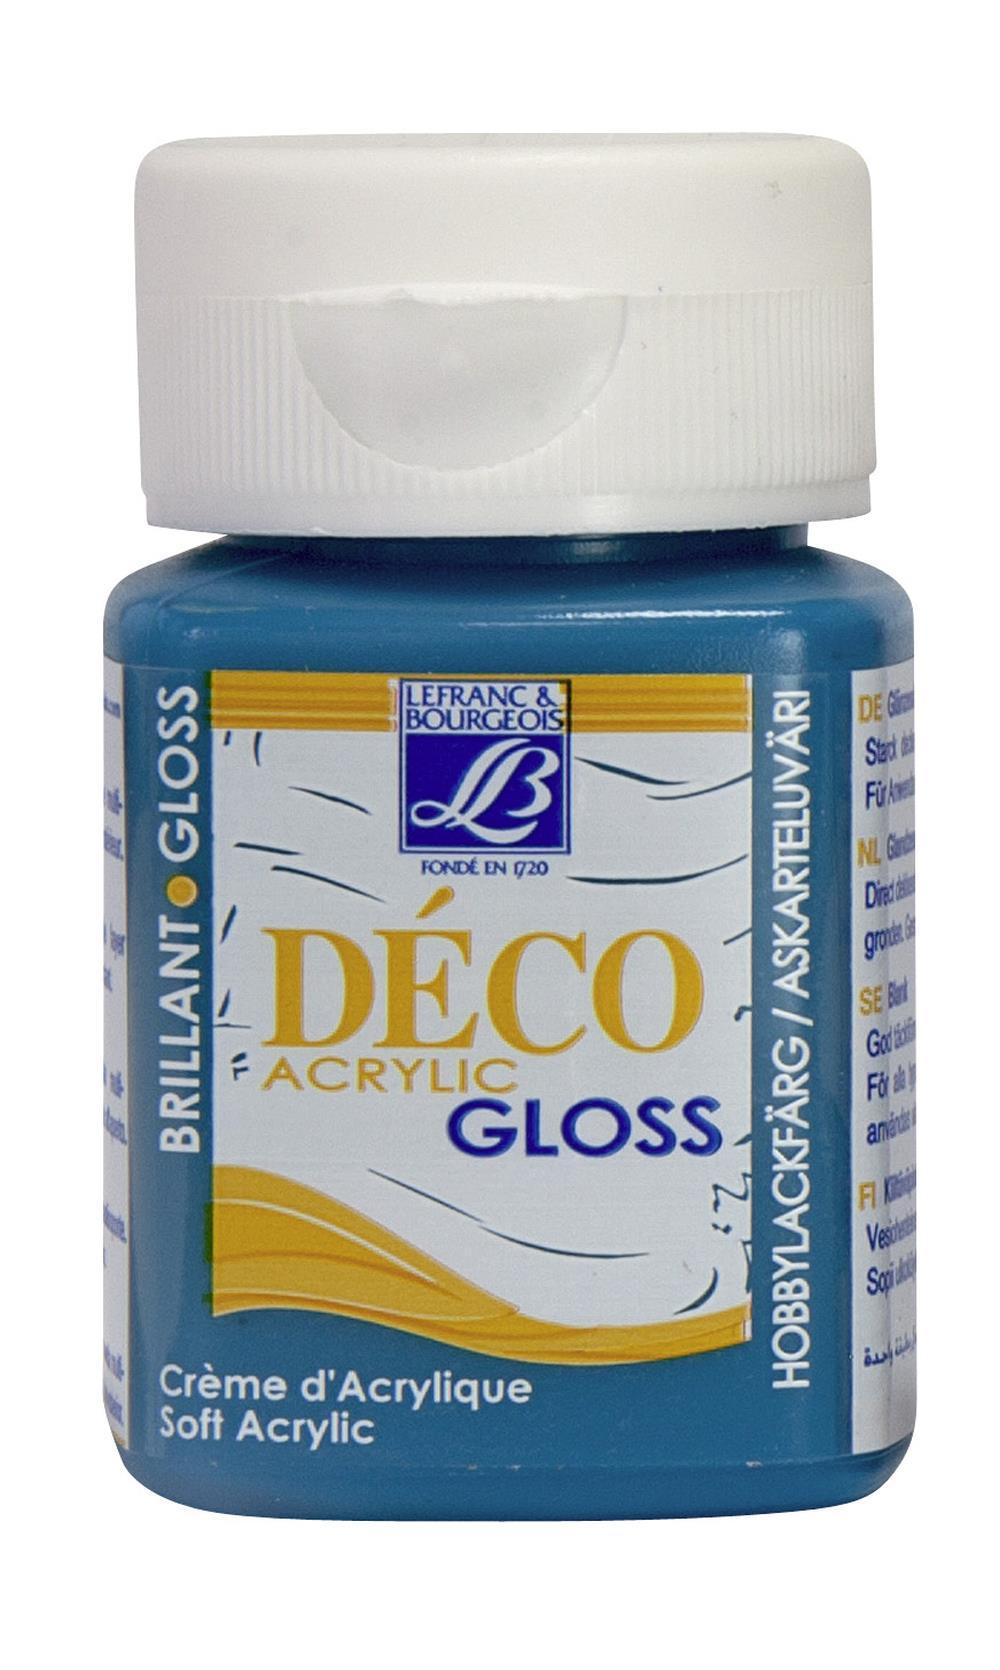 Hobbyfärg L&B Deco Gloss Akryl 50ml  Turquoise 058 (4F) utgått